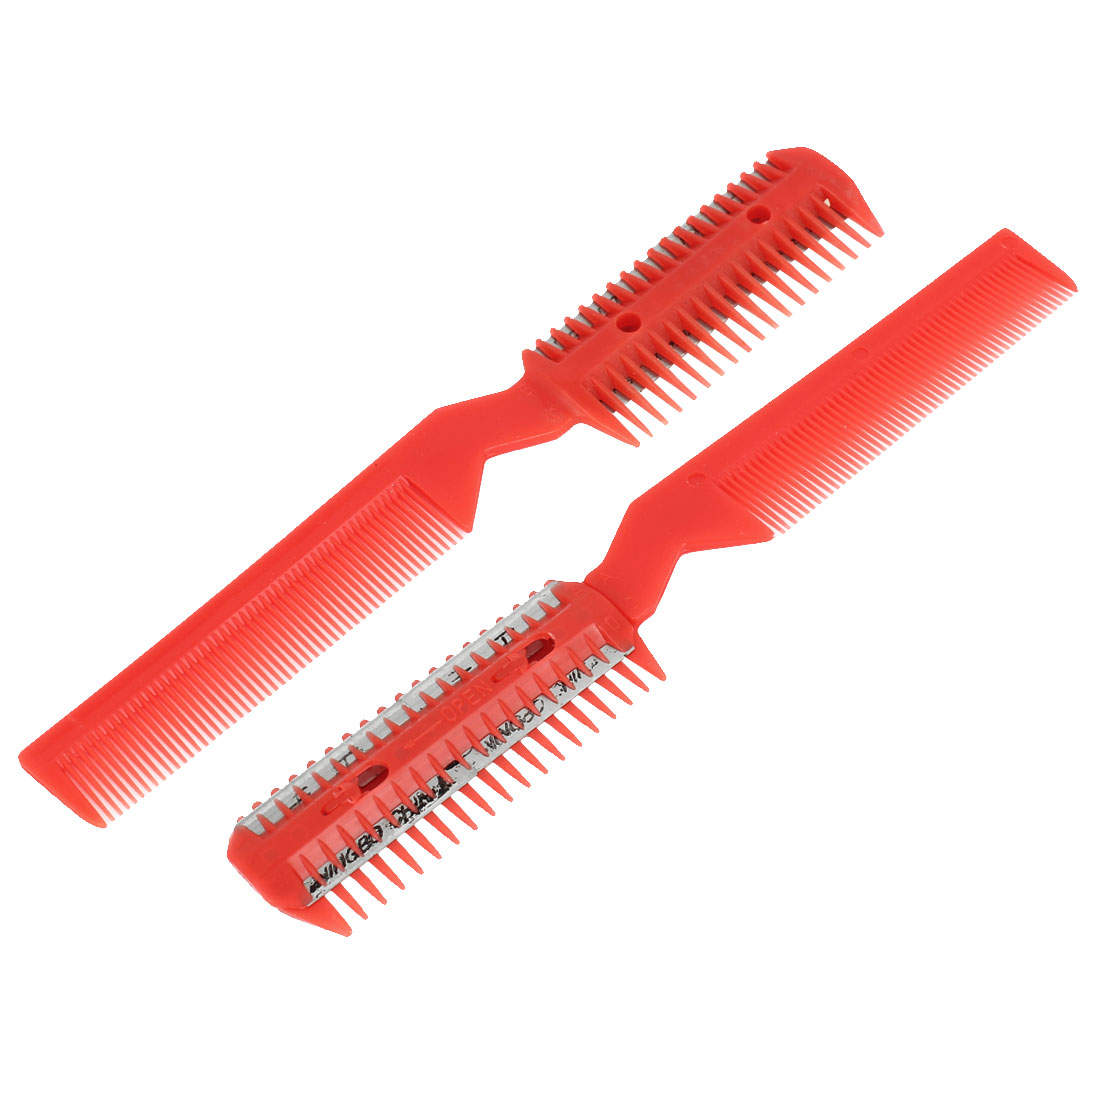 Unique Bargains Women Replacement Razor  Double End Hair Comb Trimmer Cutter Red 2 Pieces